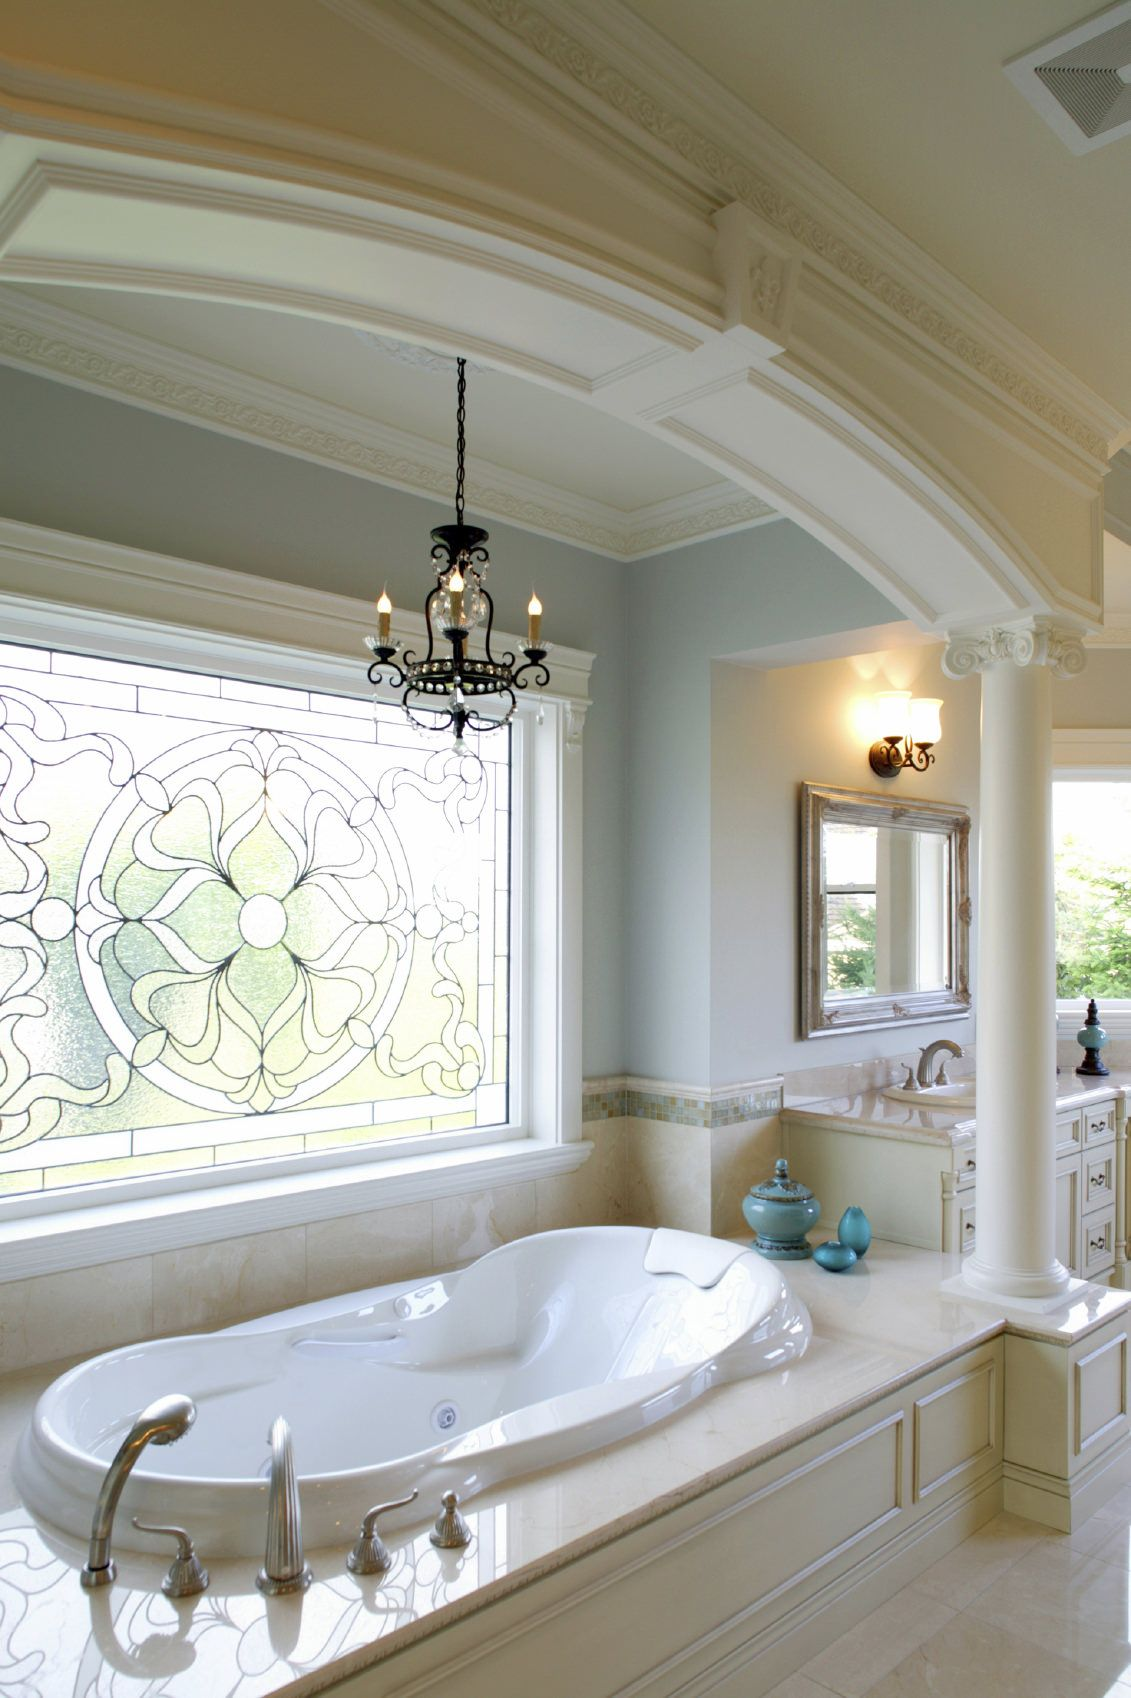 Simply Beautiful Bathrooms: 101 Custom Master Bathroom Design Ideas (2019 Photos